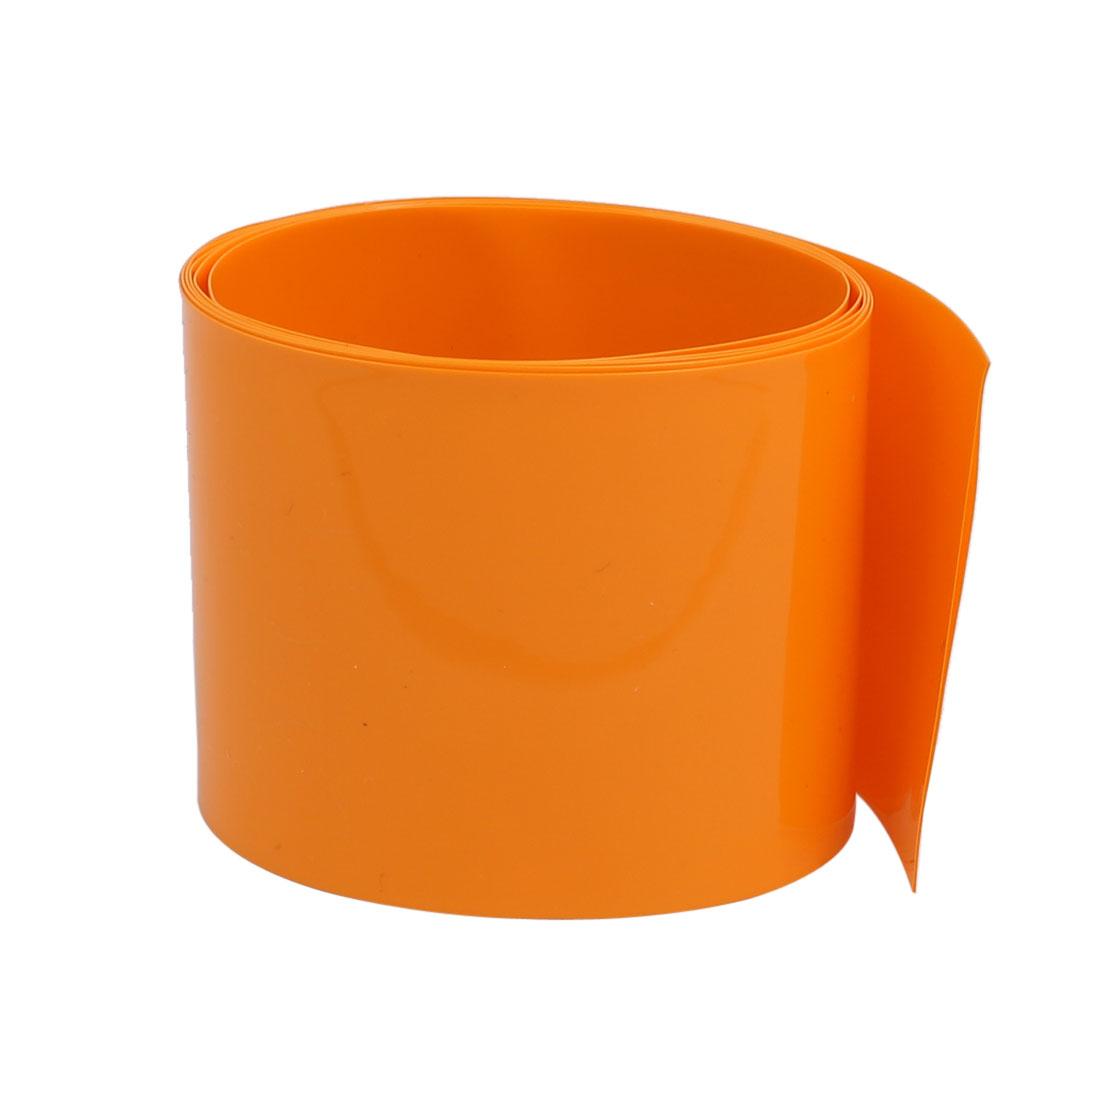 55mm Flat Width 1 Meter Long PVC Heat Shrinkable Tube Orange for AAA Battery